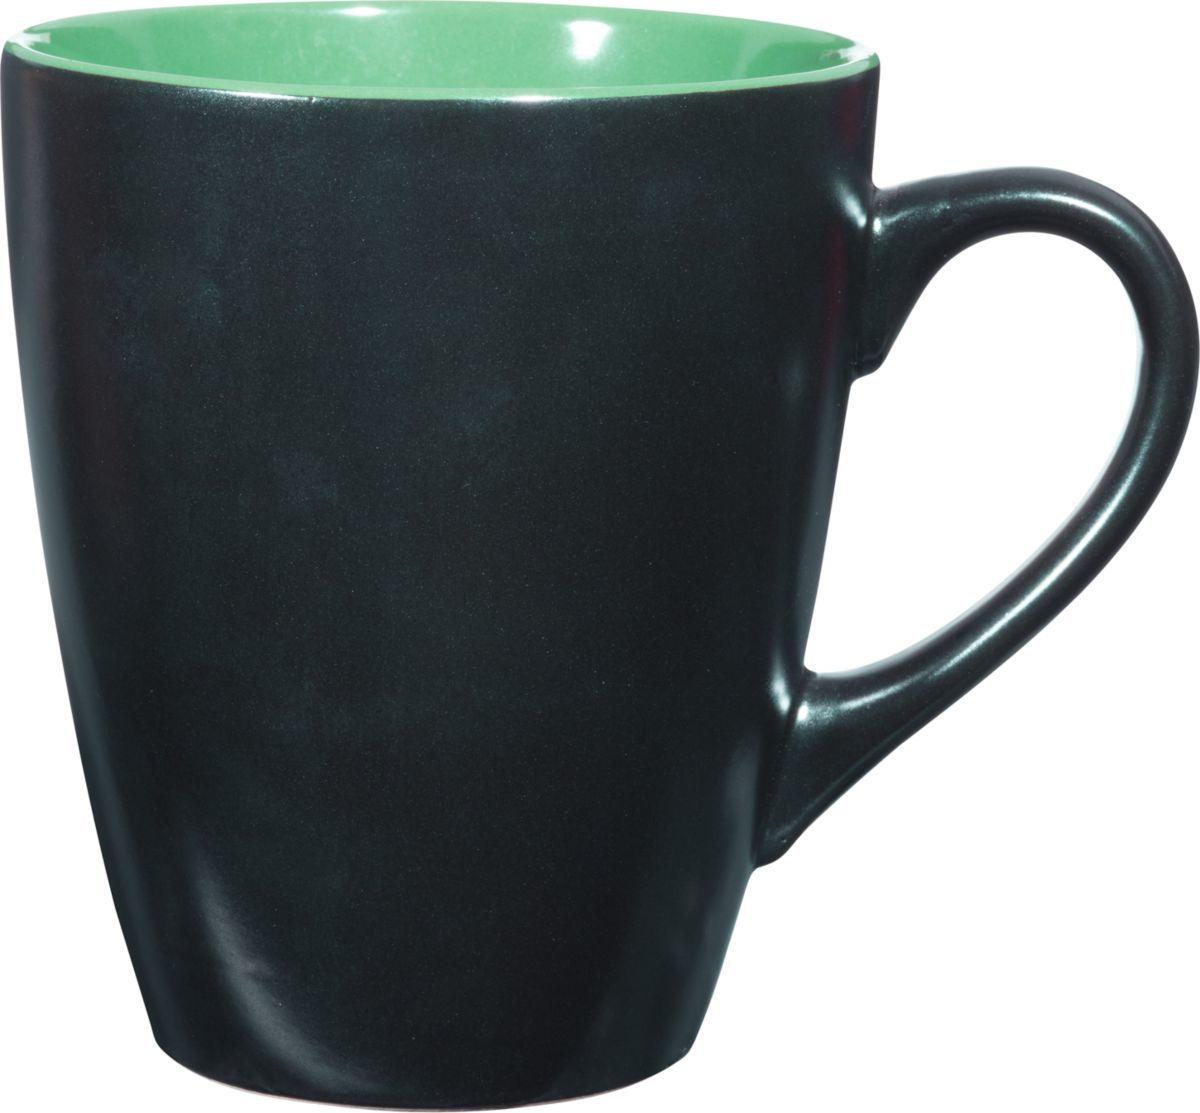 Cabela's Giant Matte Mug